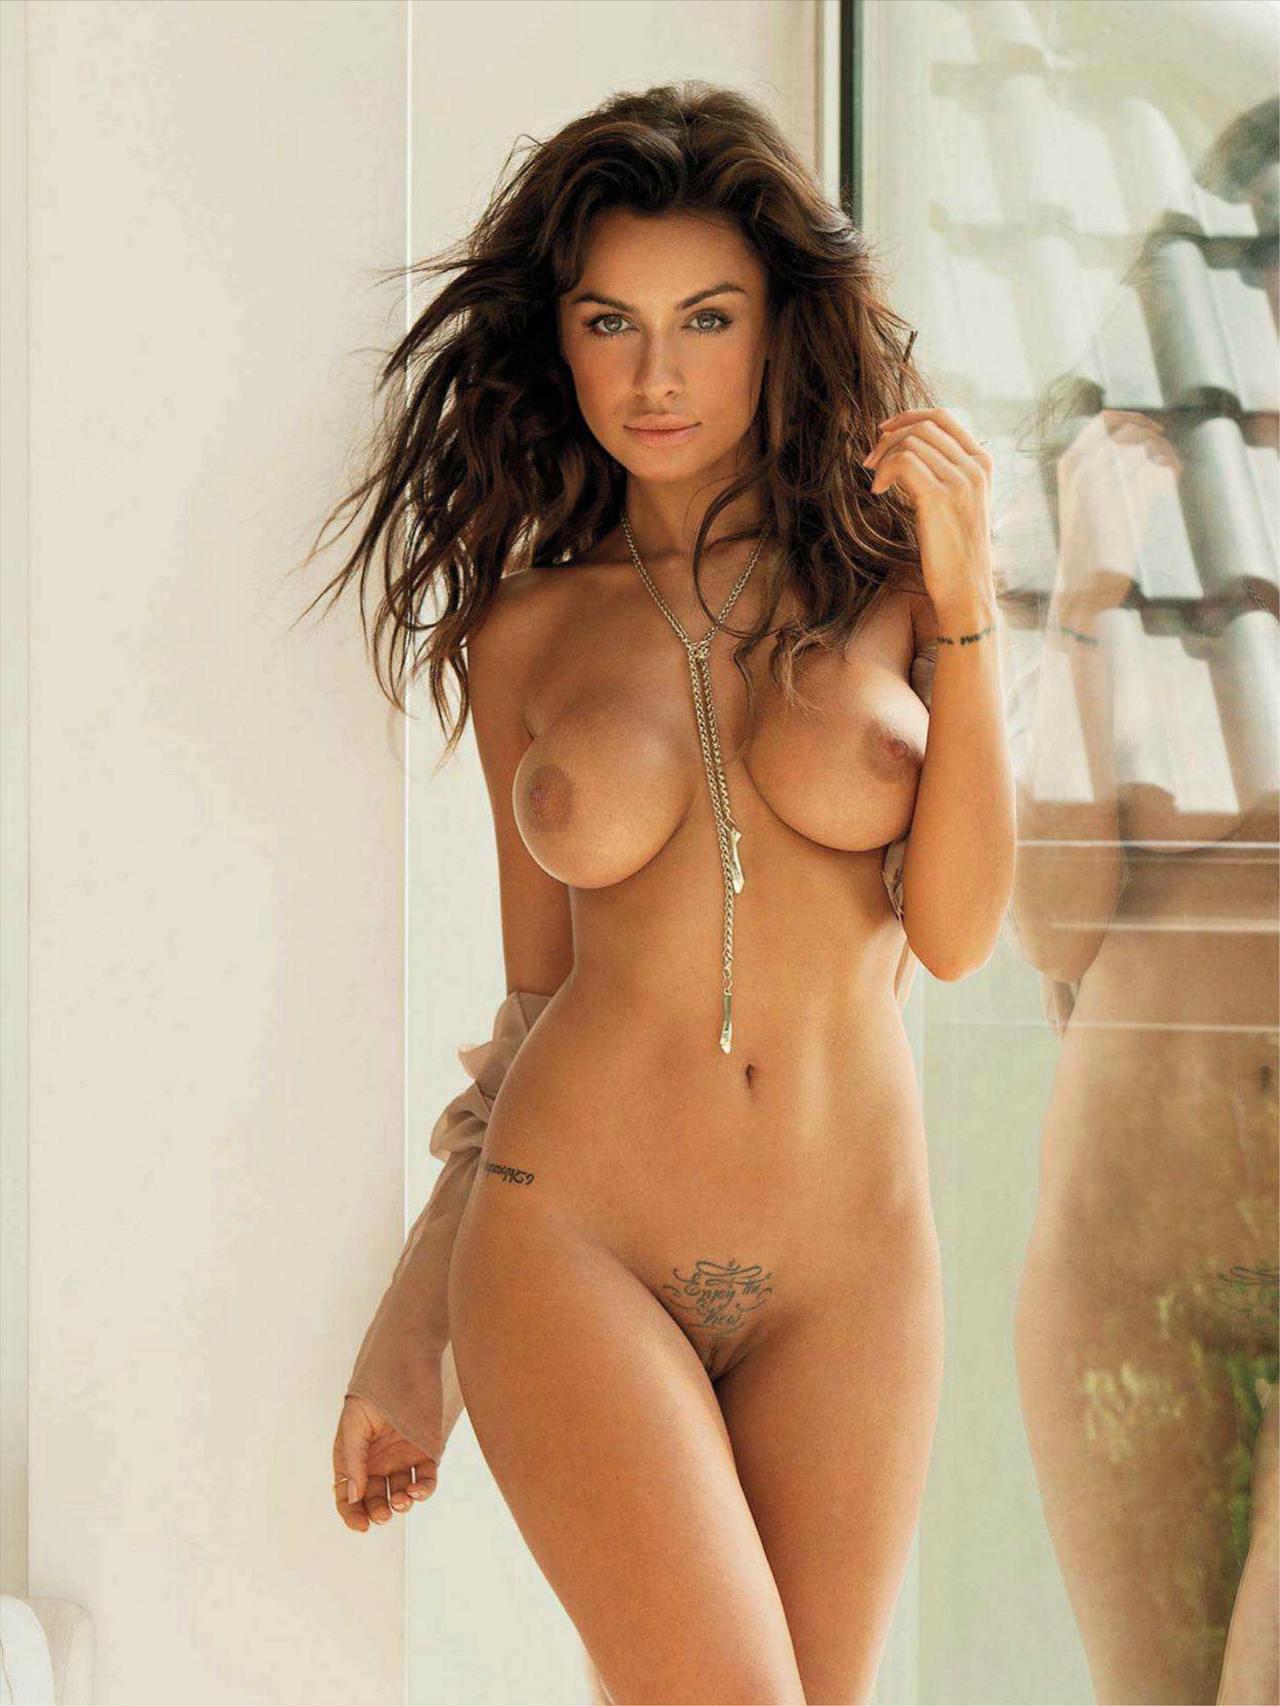 Nude natalia girls siwiec